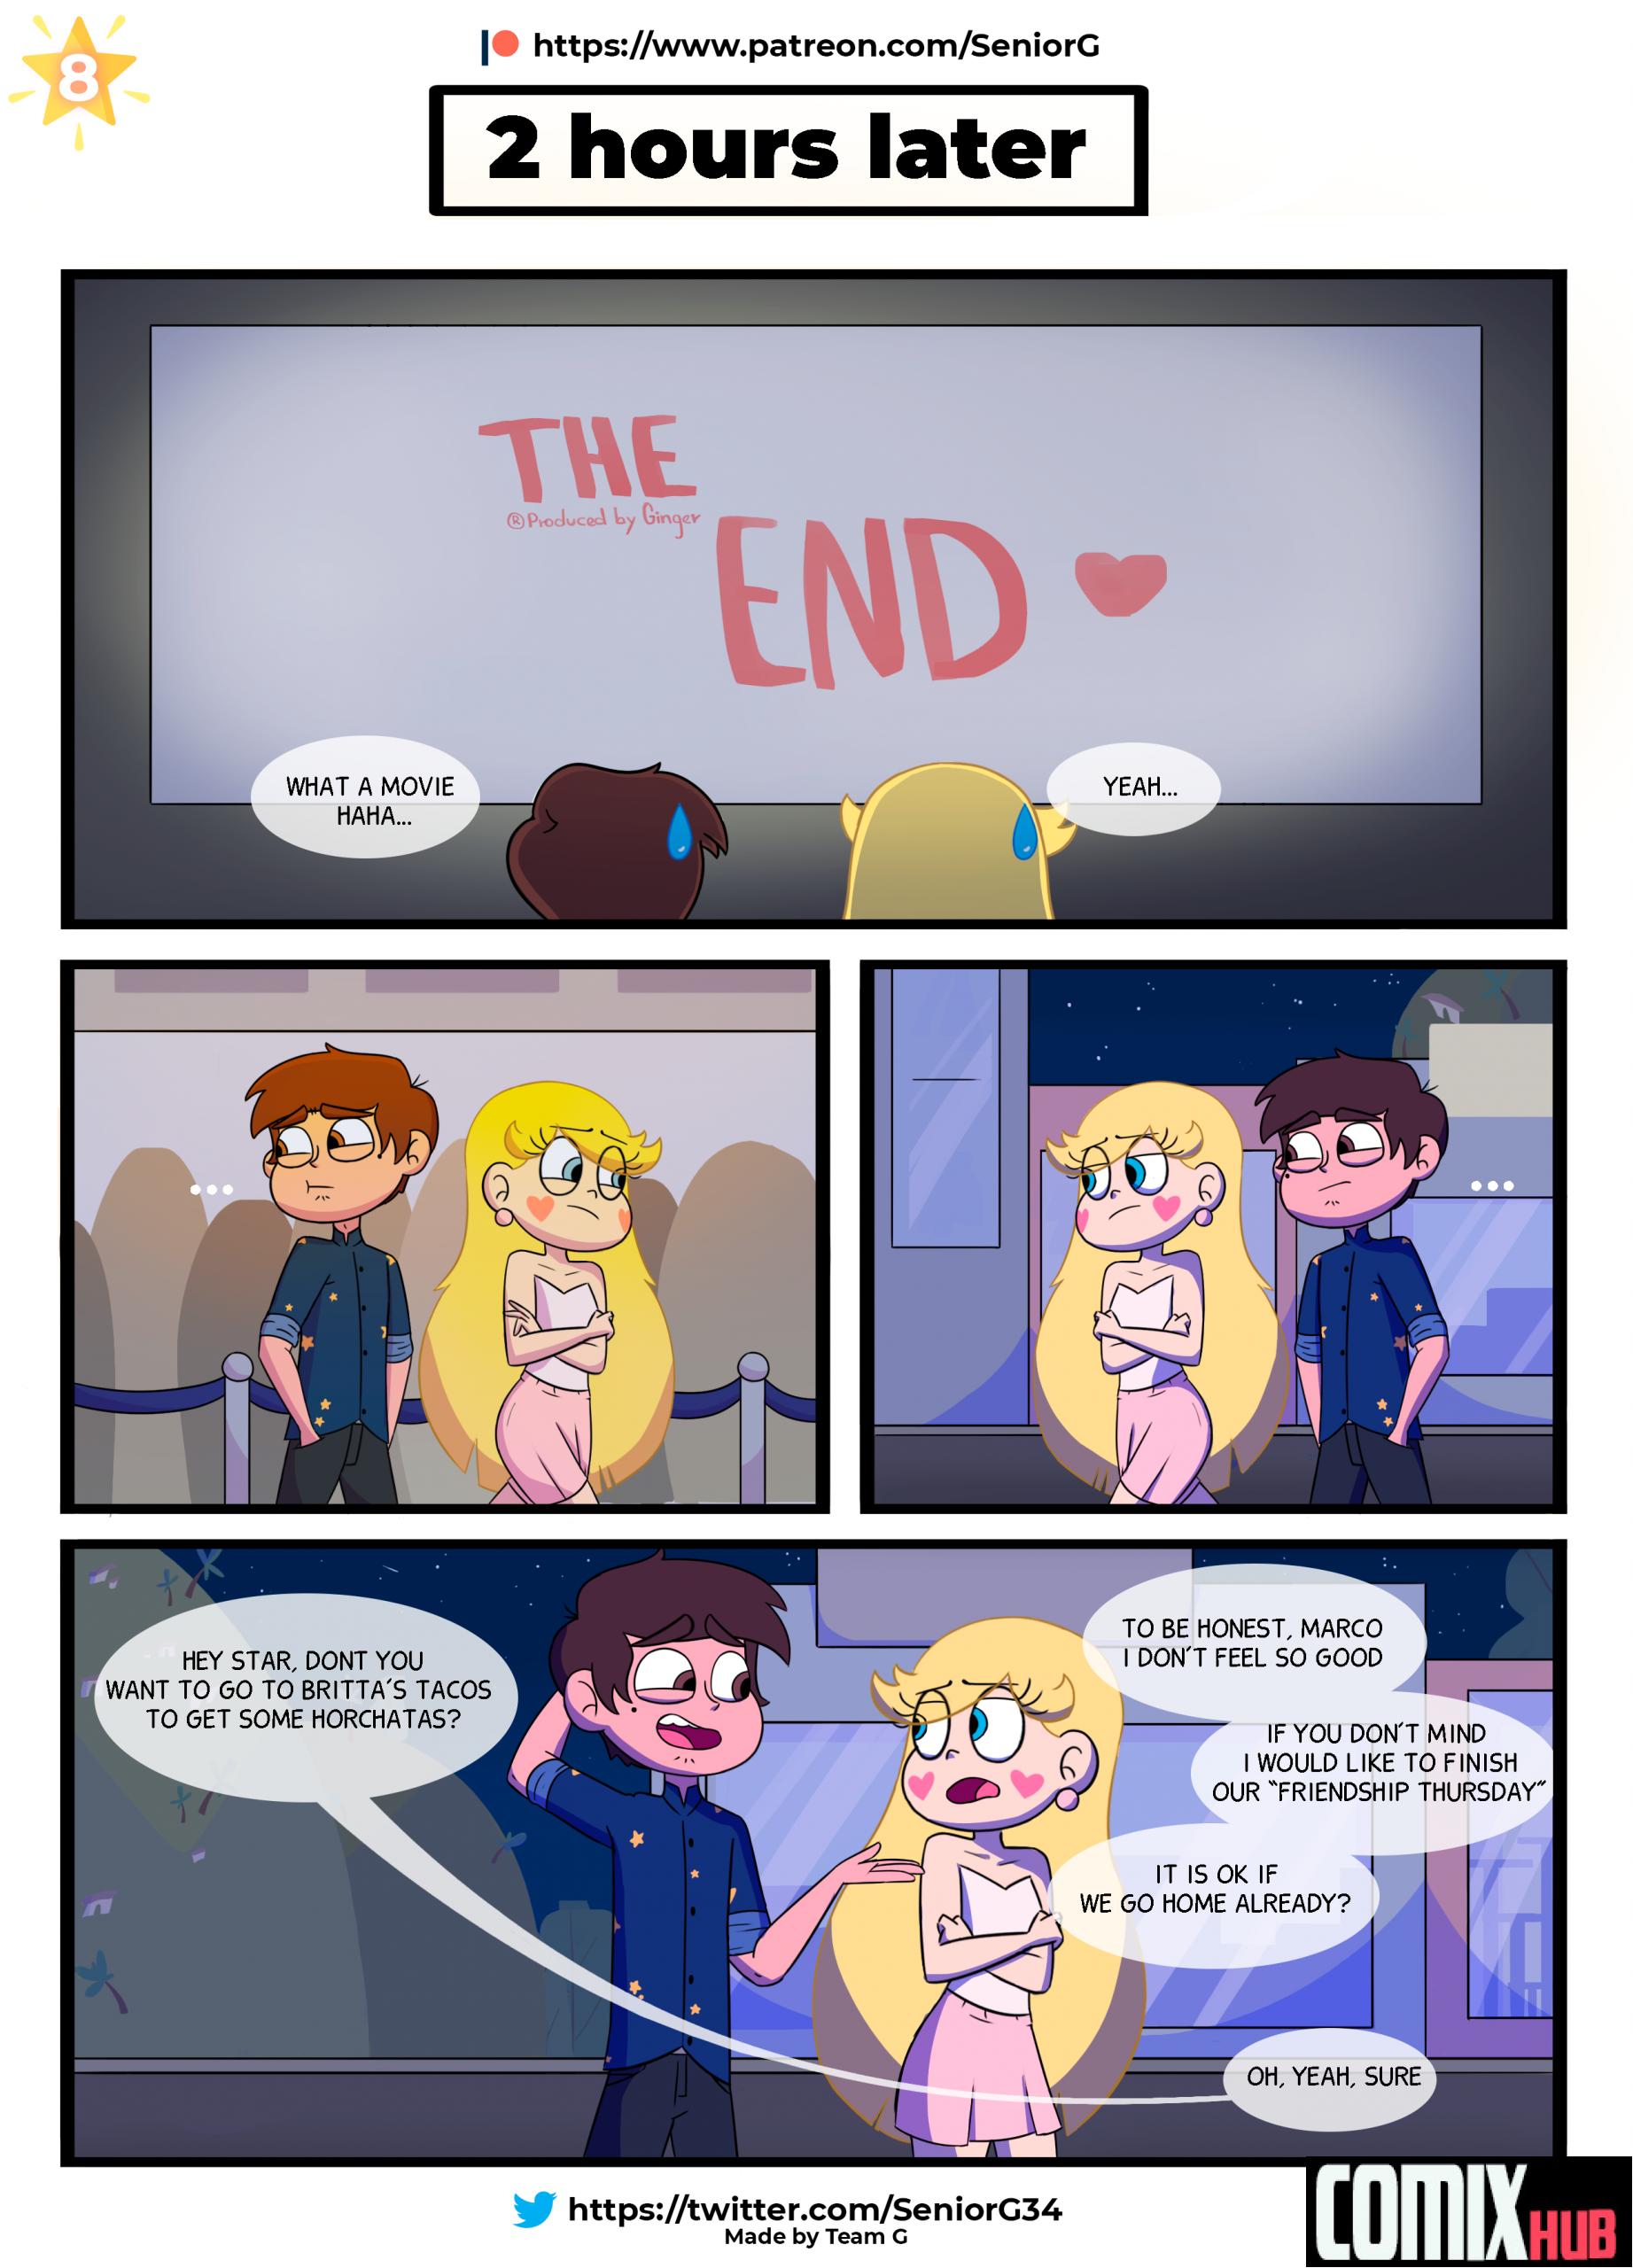 Porn comics, Friendship thursday Masturbation